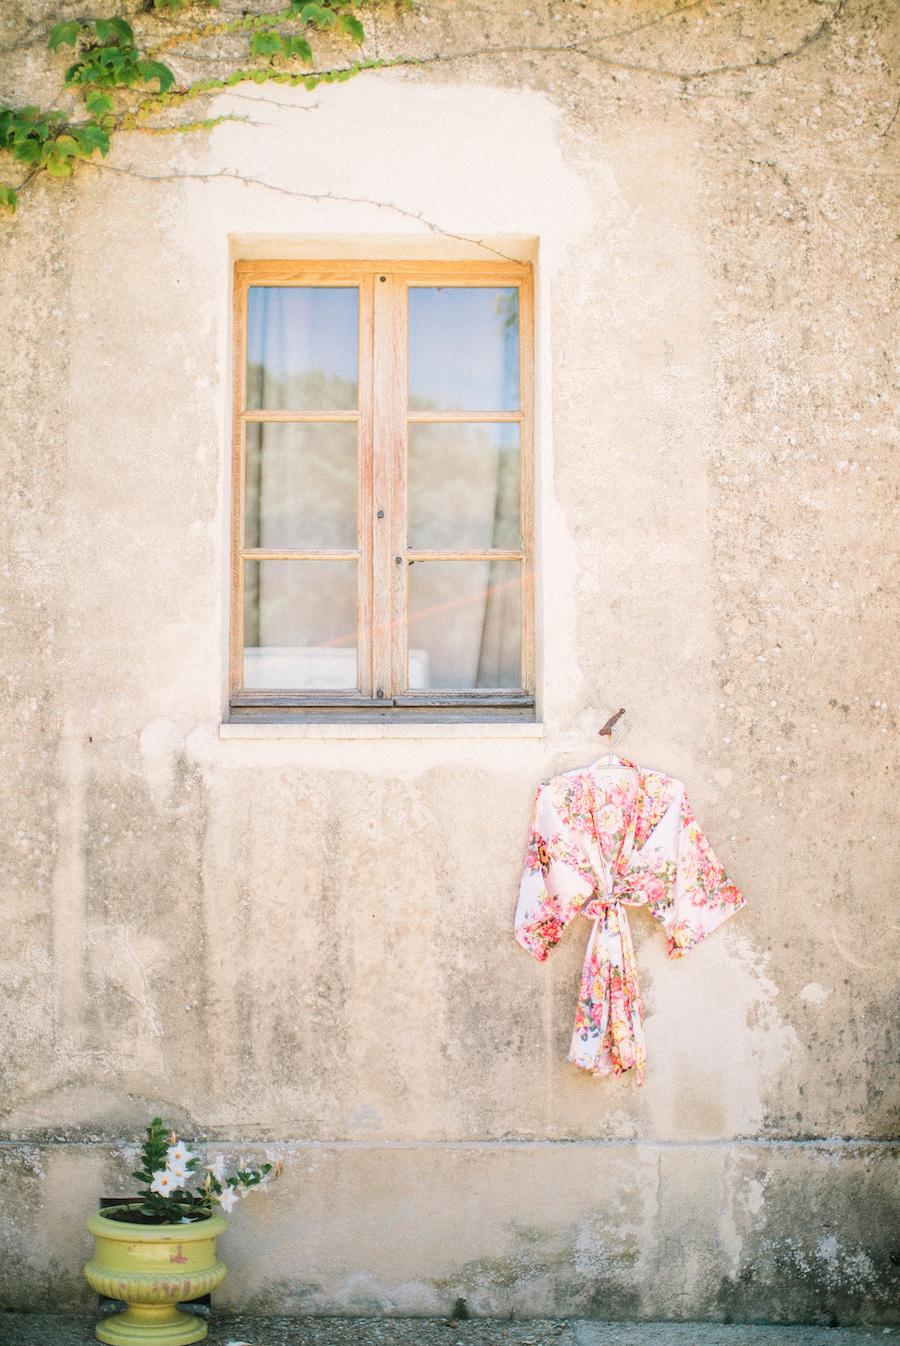 saya-photography-jewish-wedding-provence-rustic-lourmarin-le-galinier-24.jpg